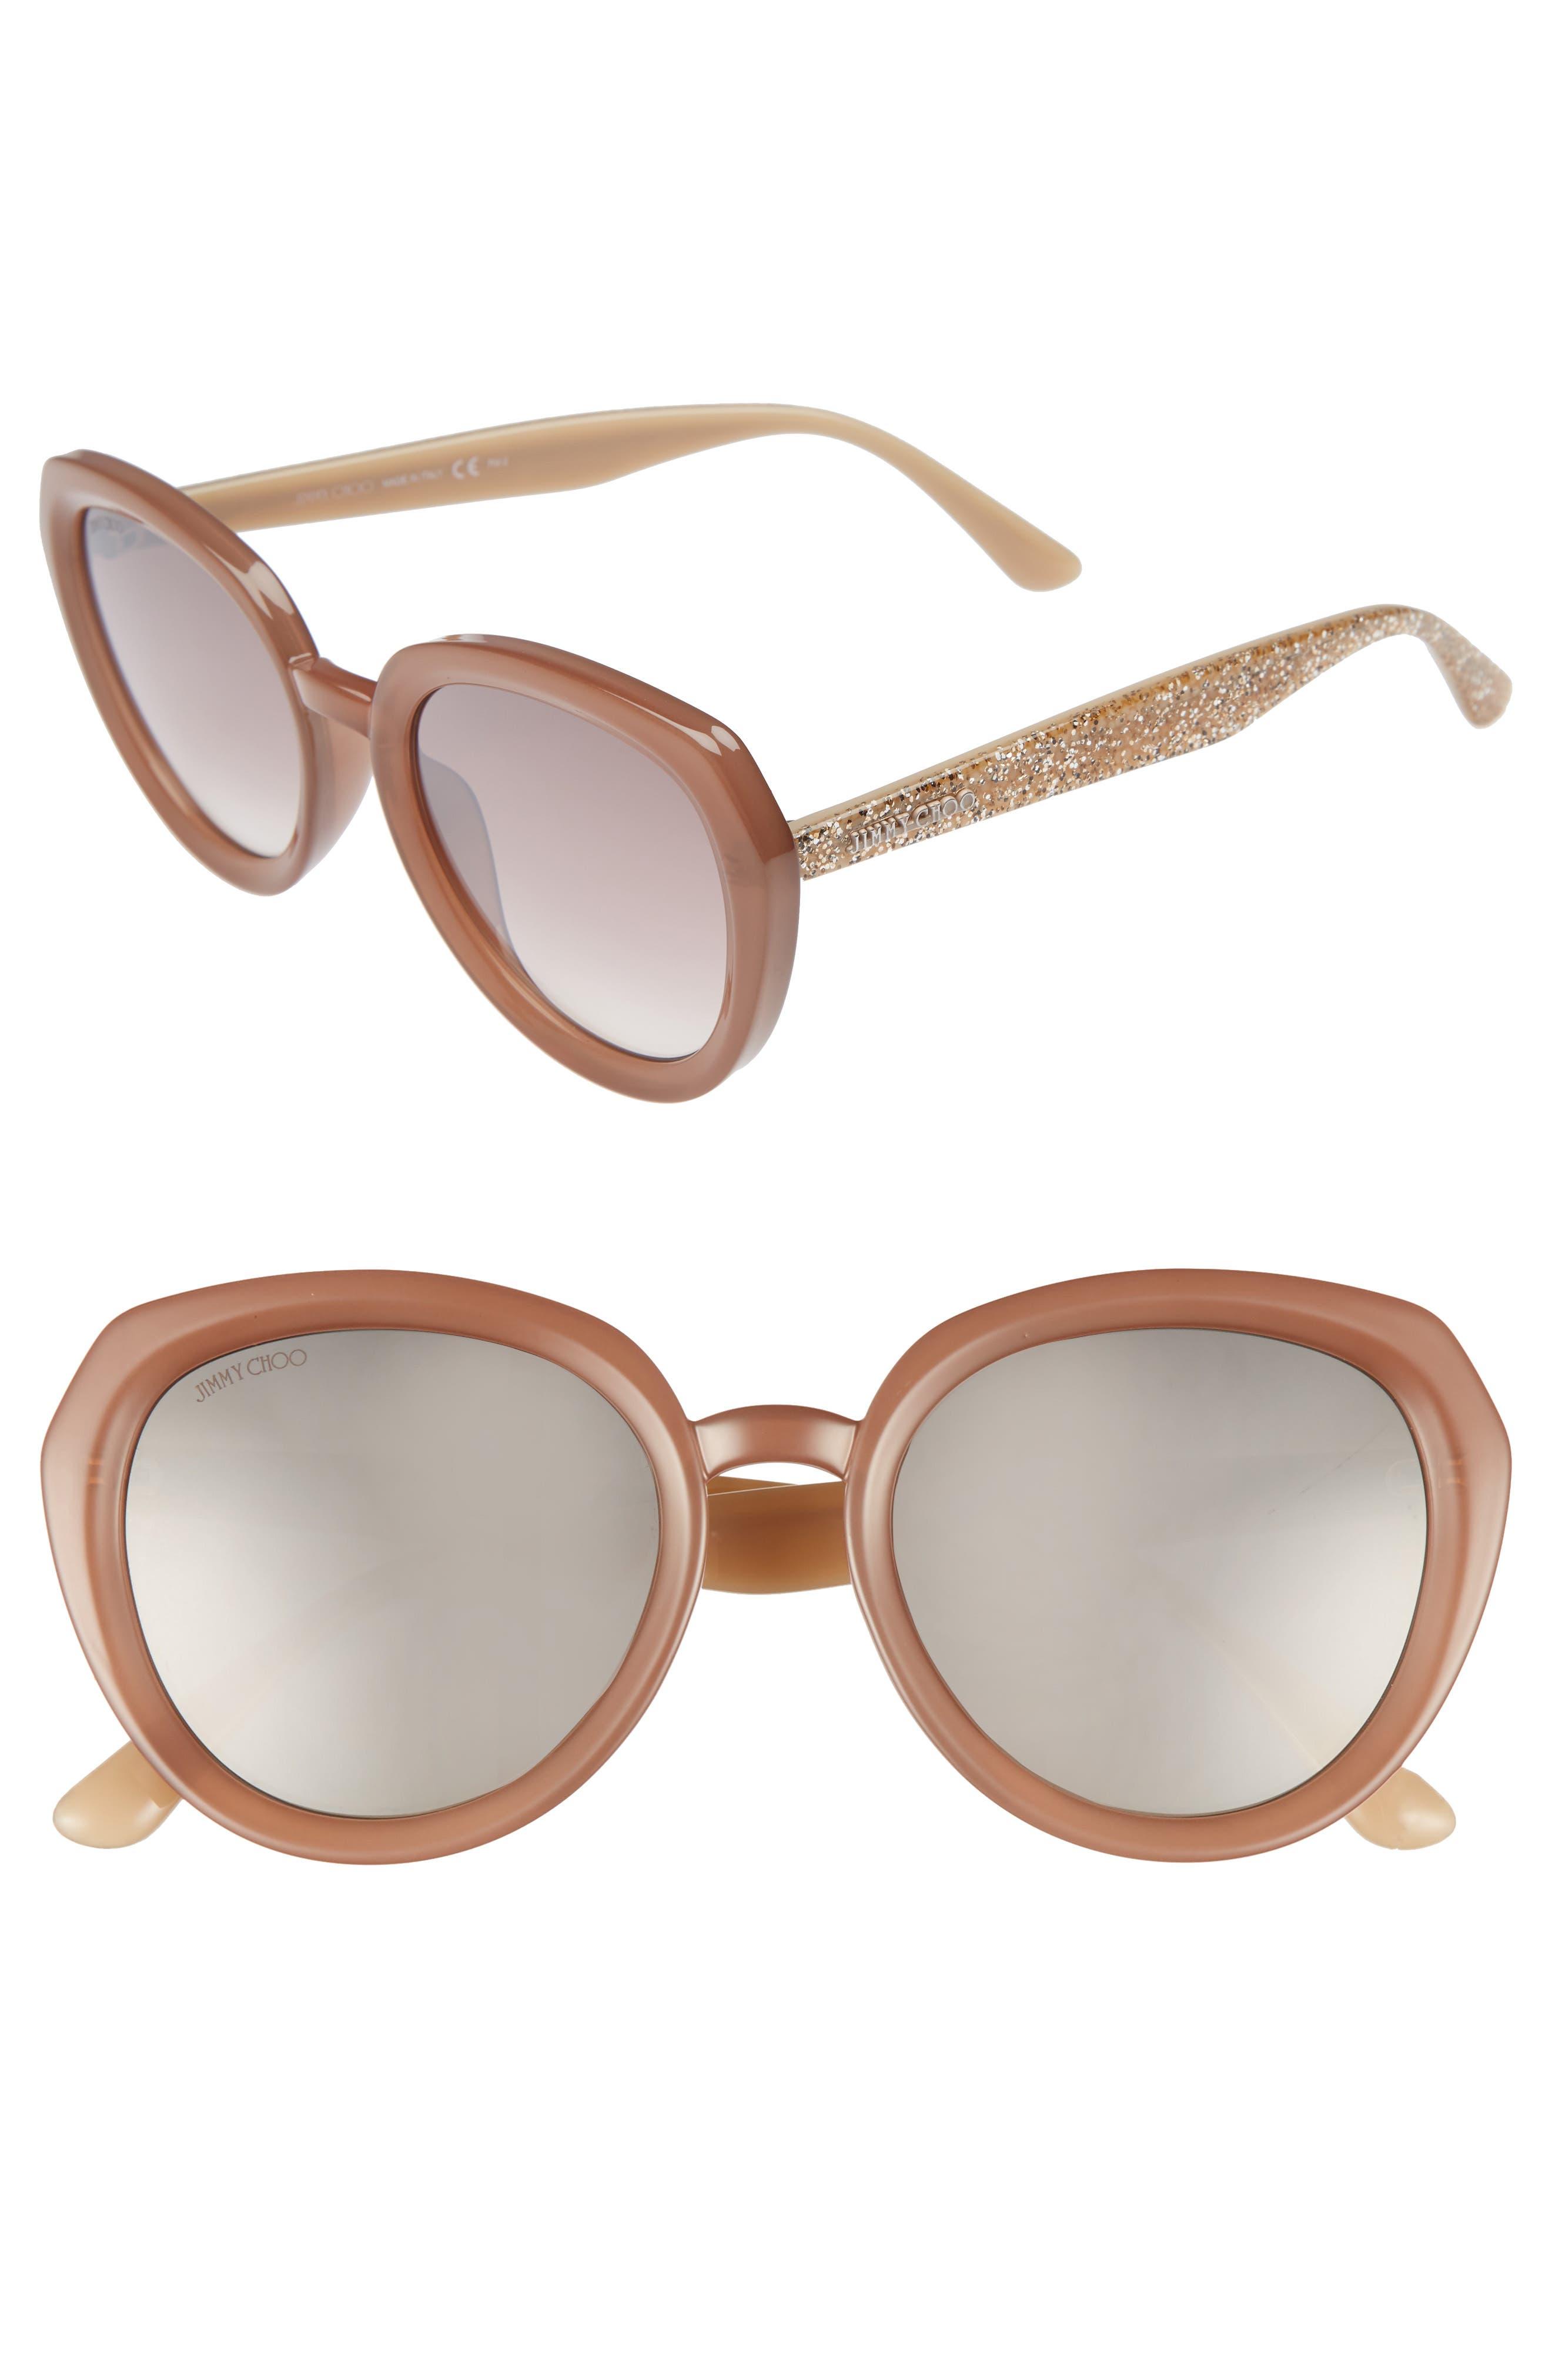 Main Image - Jimmy Choo Maces 53mm Oversize Sunglasses